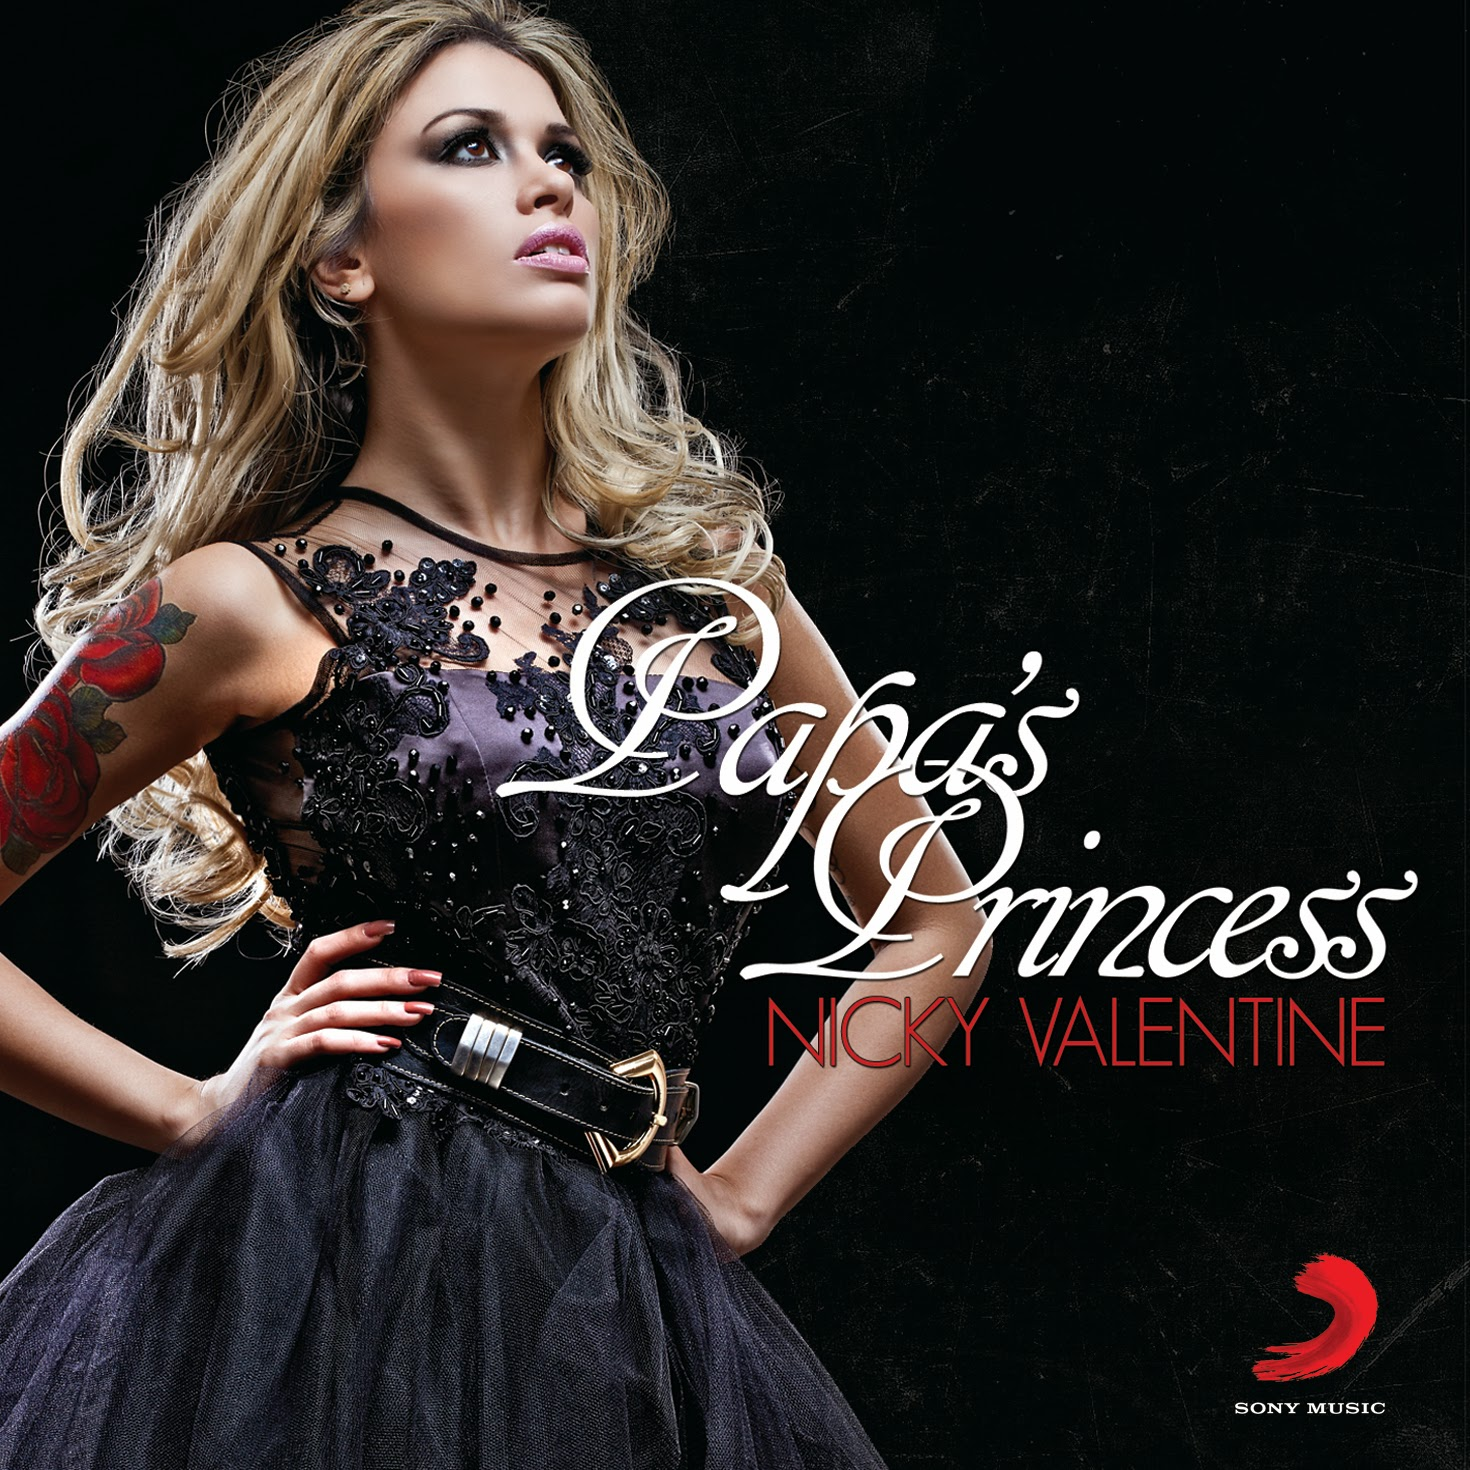 Nicky Valentine - Papa's Princess (Cover Album)